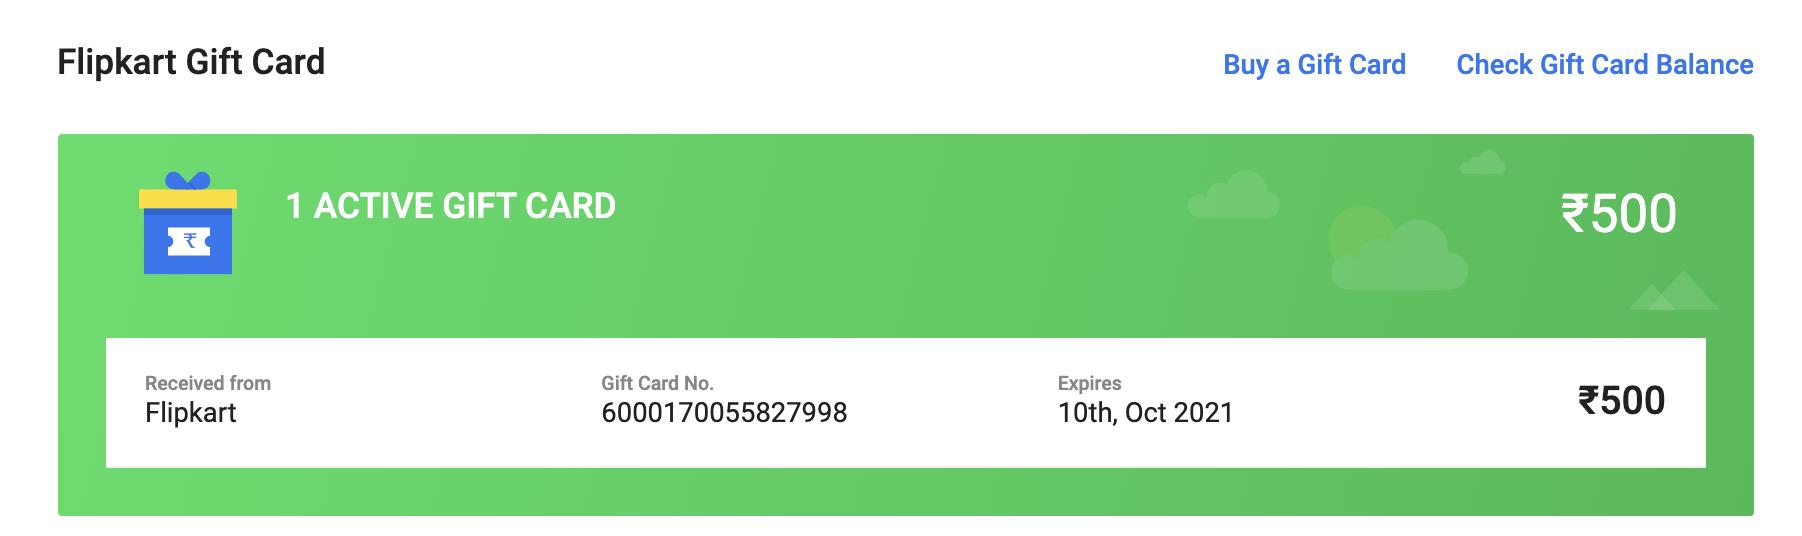 Get Free Flipkart Gift card worth 500 INR